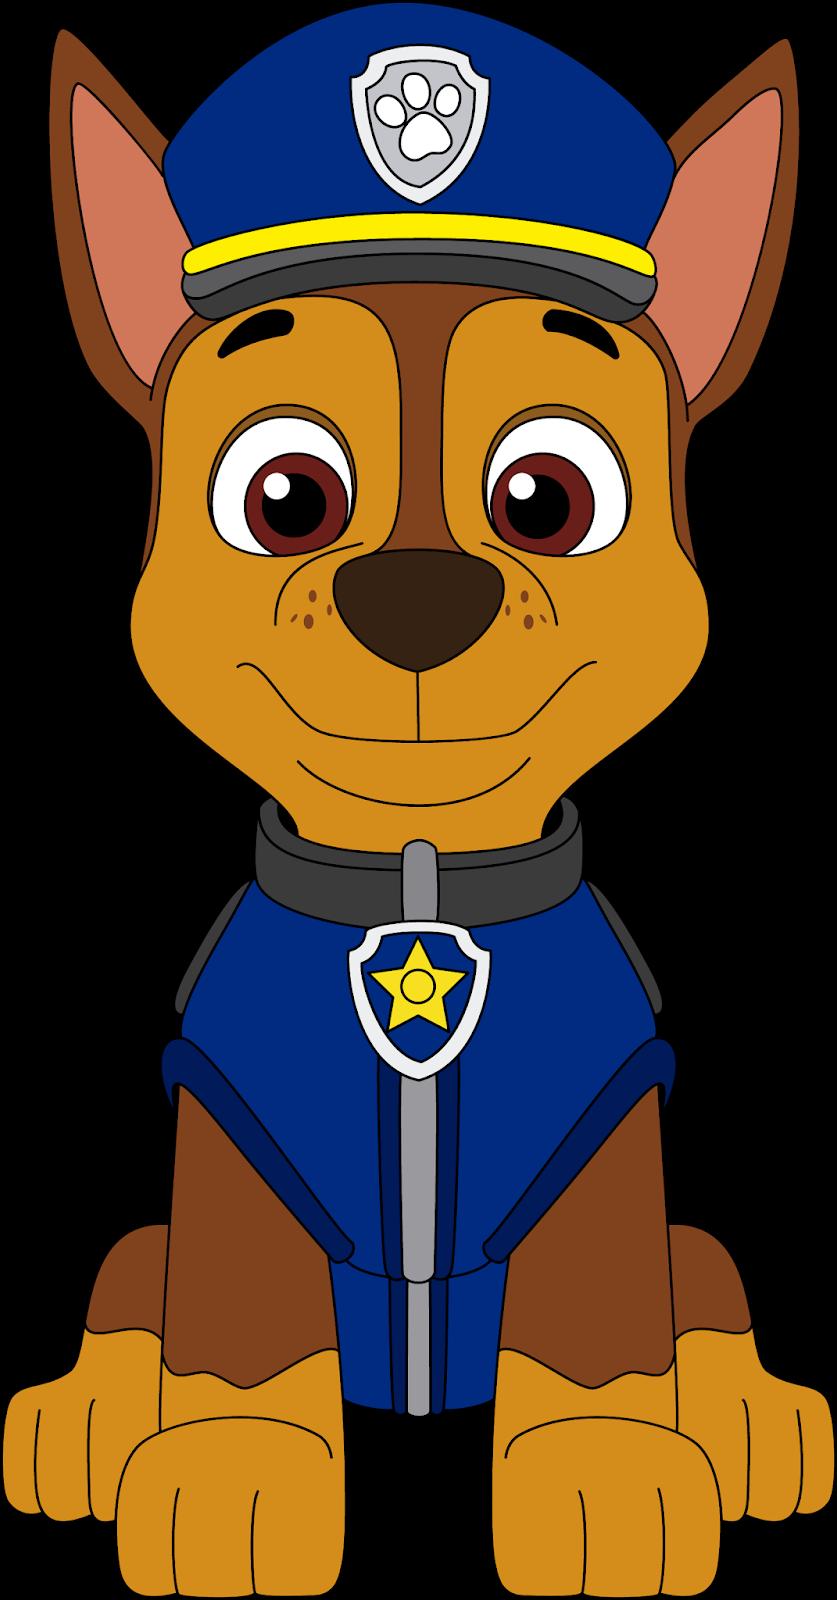 Paw Patrol Chase Clipart Paw Patrol Cartoon Paw Patrol Coloring Paw Patrol Birthday